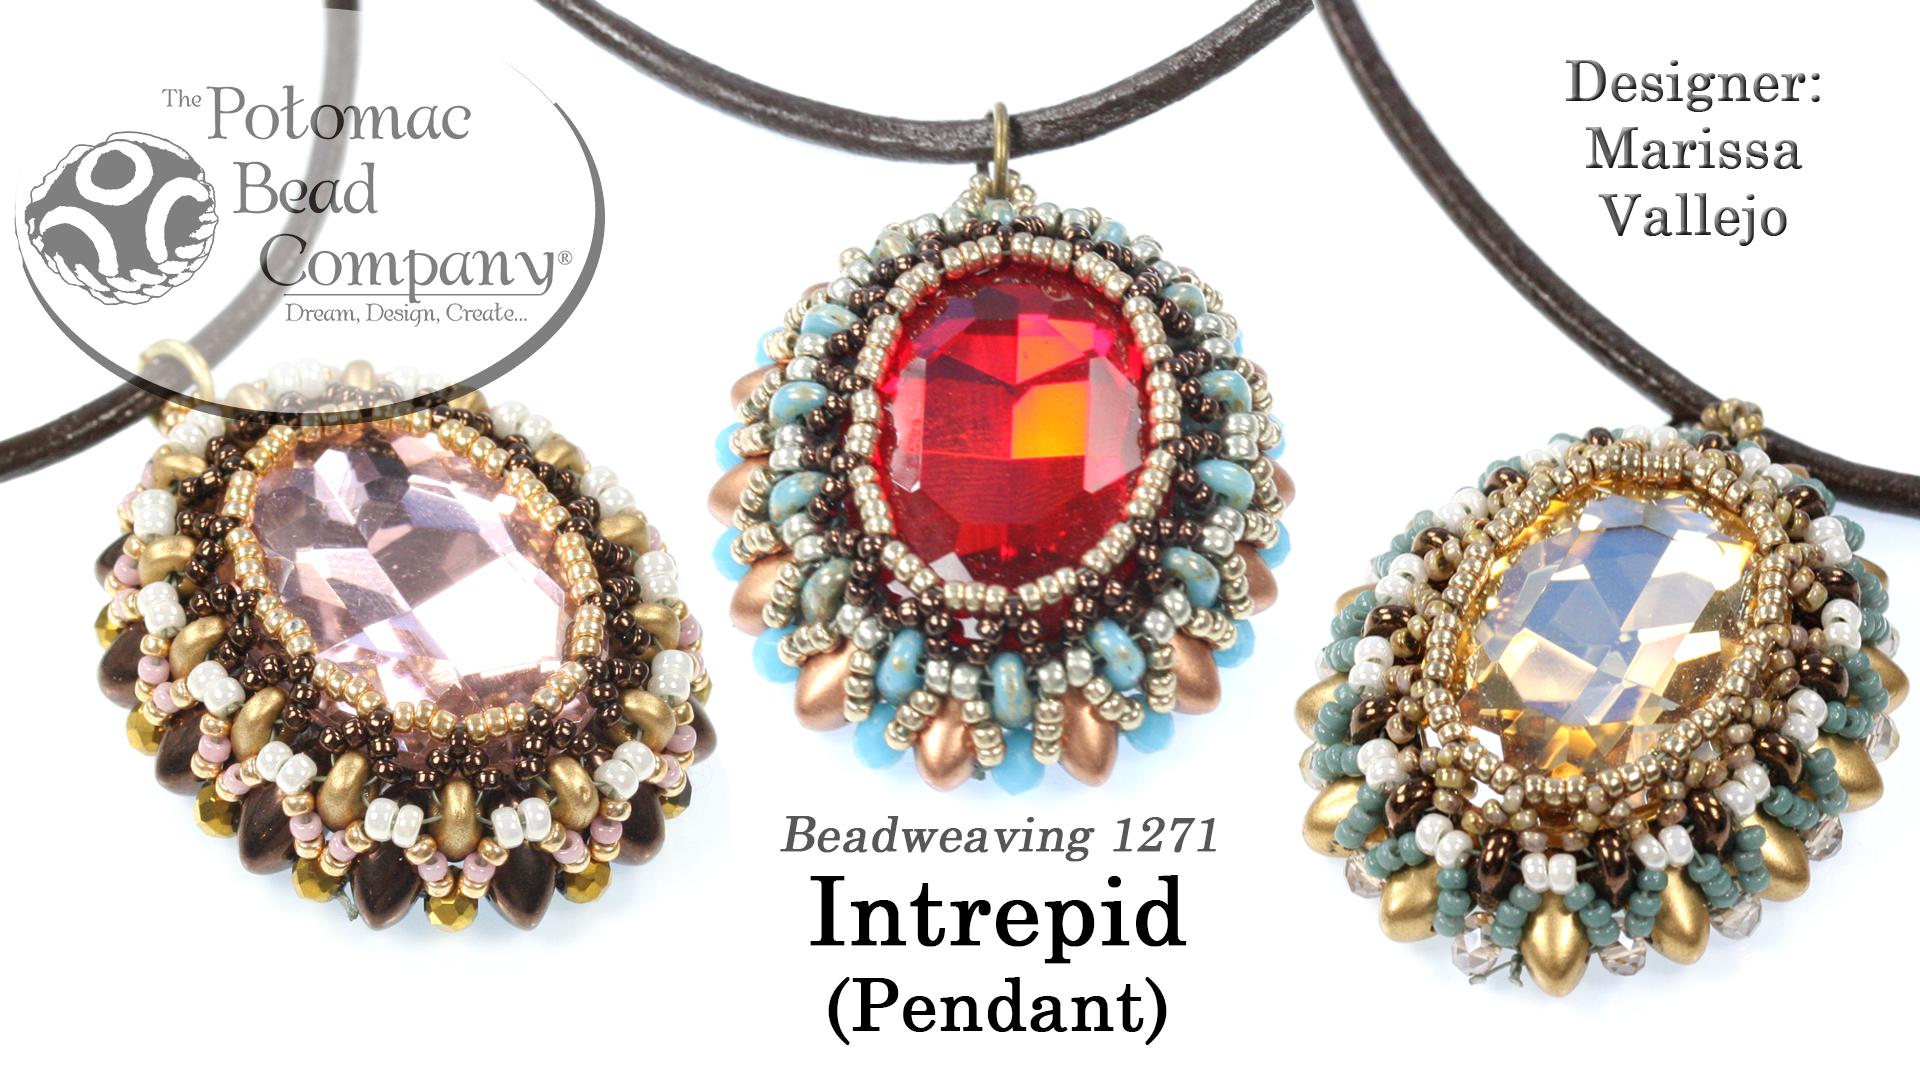 How to Bead Jewelry / Videos Sorted by Beads / IrisDuo® Bead Videos / Intrepid Pendant Tutorial